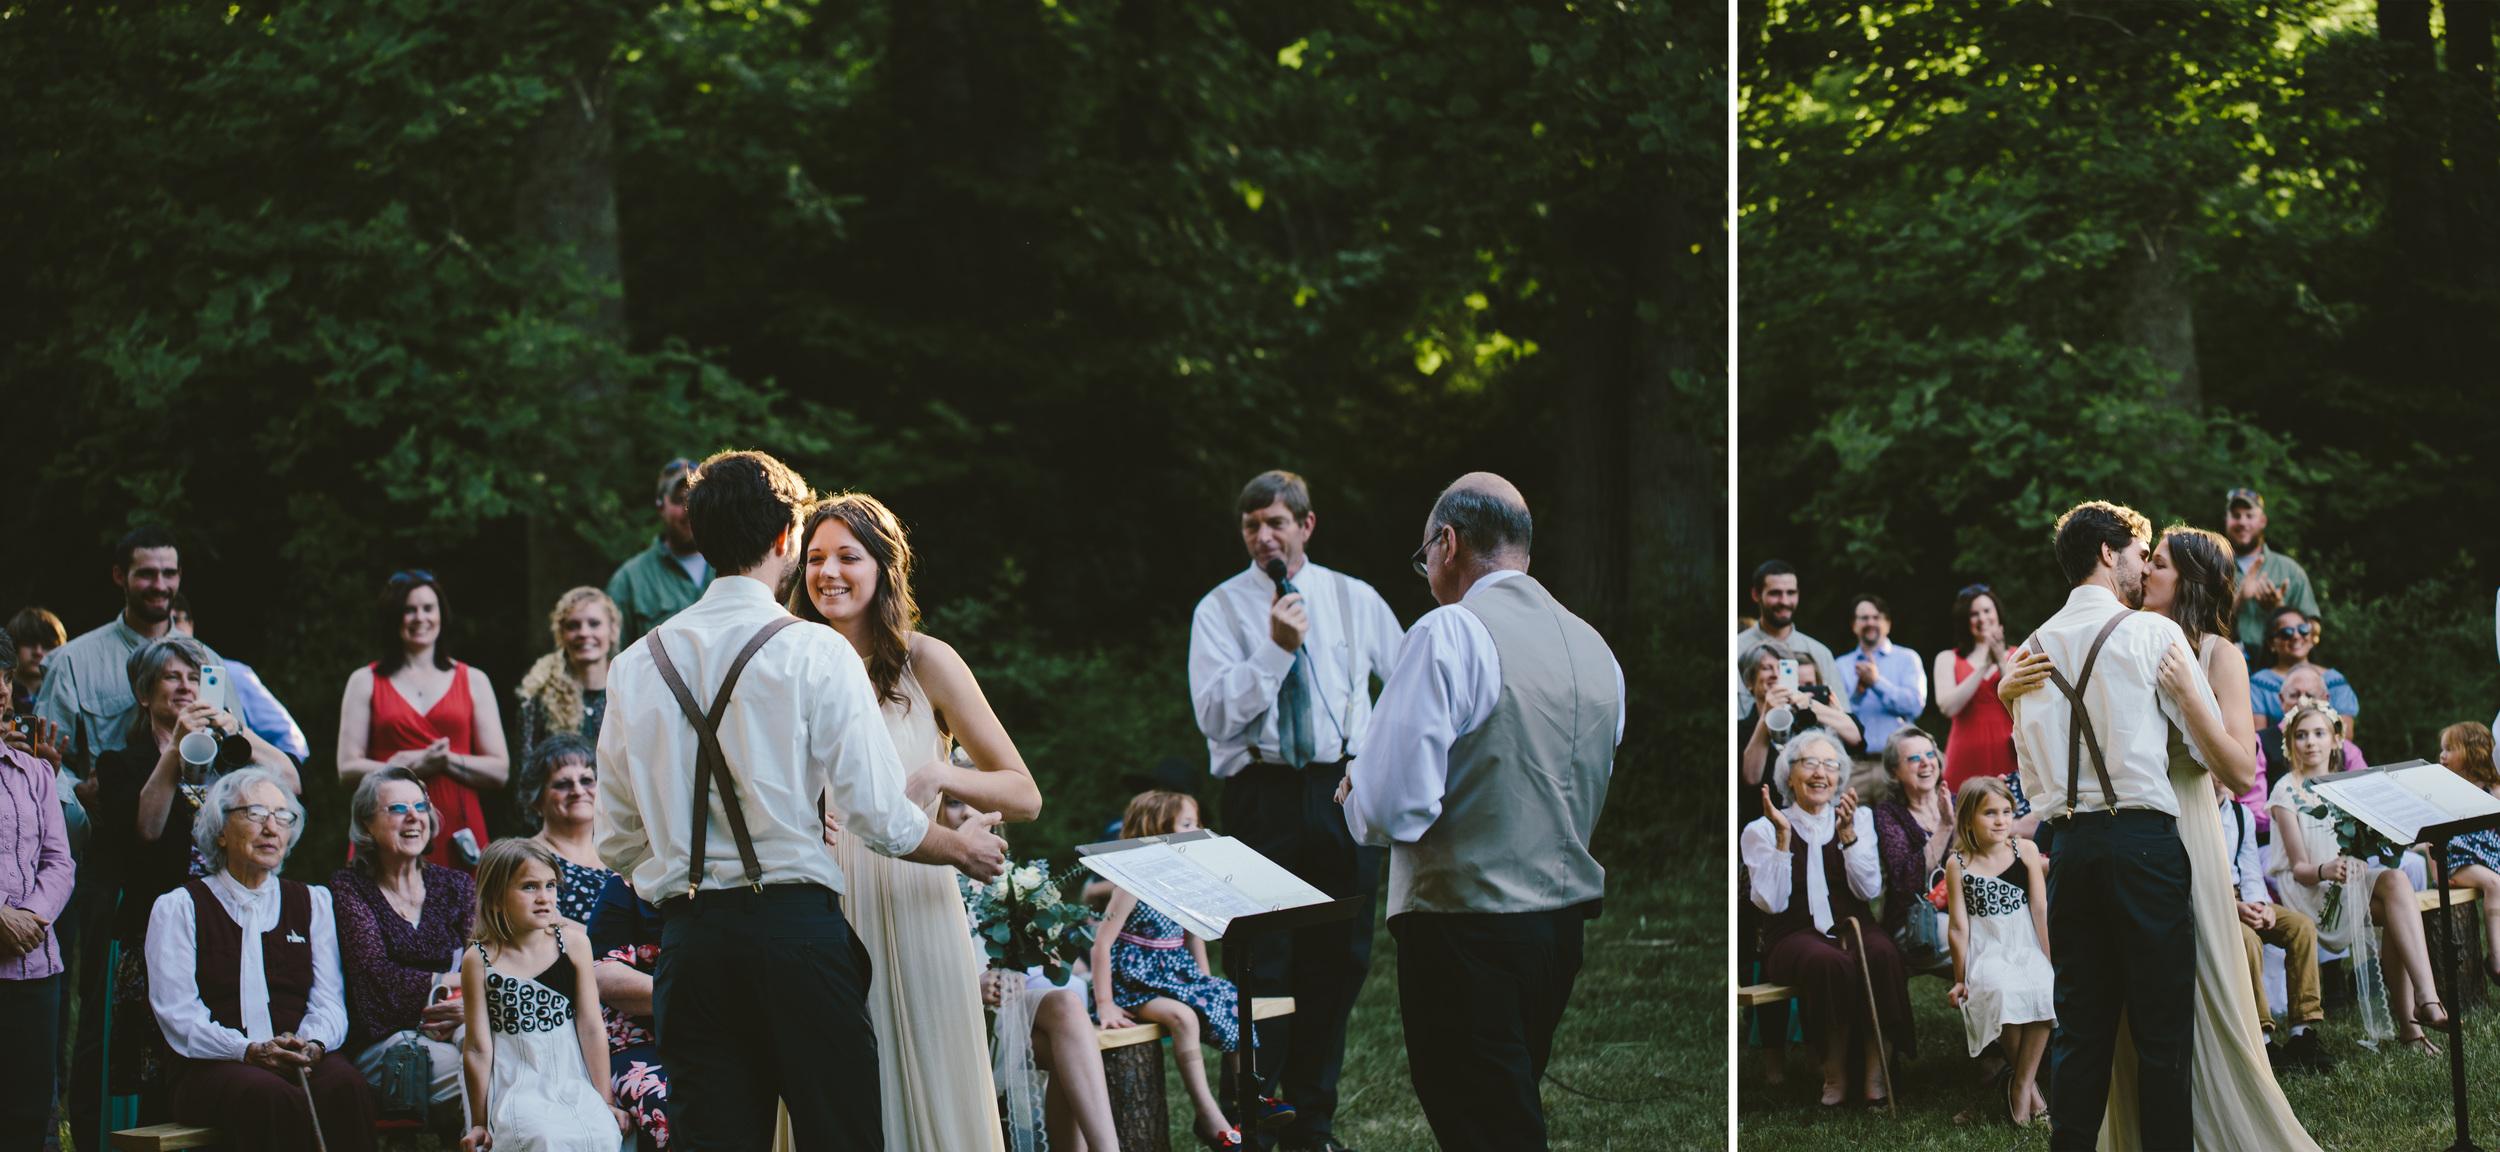 Zack + Hannah Millsaps Wedding in Greenville SC Nashville Wedding Photographer Photography Anthology-68 copy.jpg